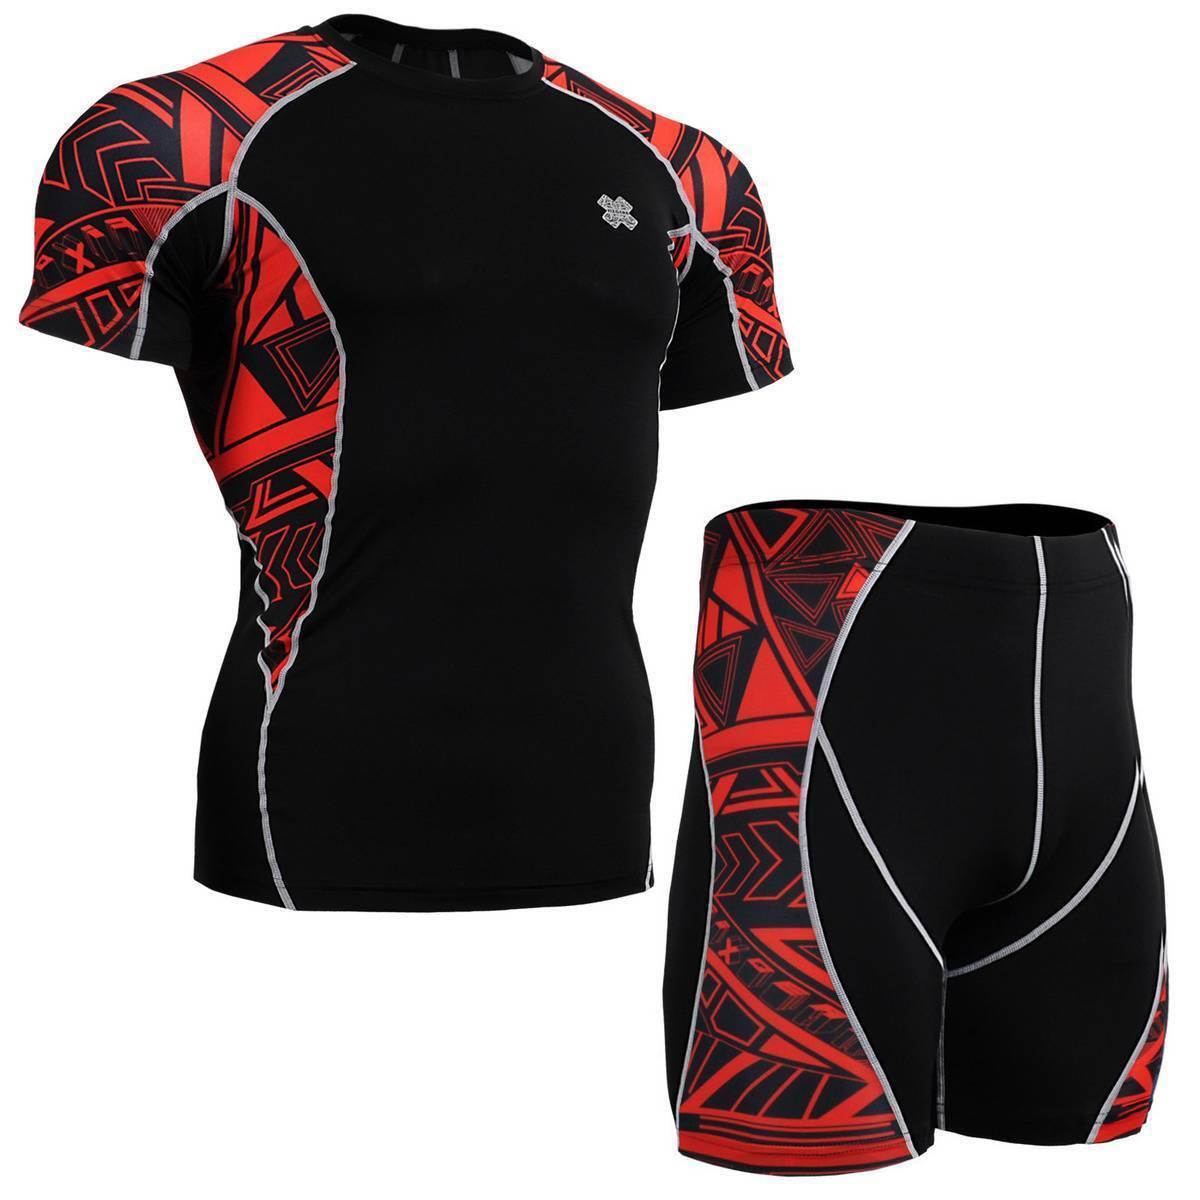 FIXGEAR C2S/P2-B2 SET Compression Shirt & Shorts Skin Tights MMA Fitness Workout